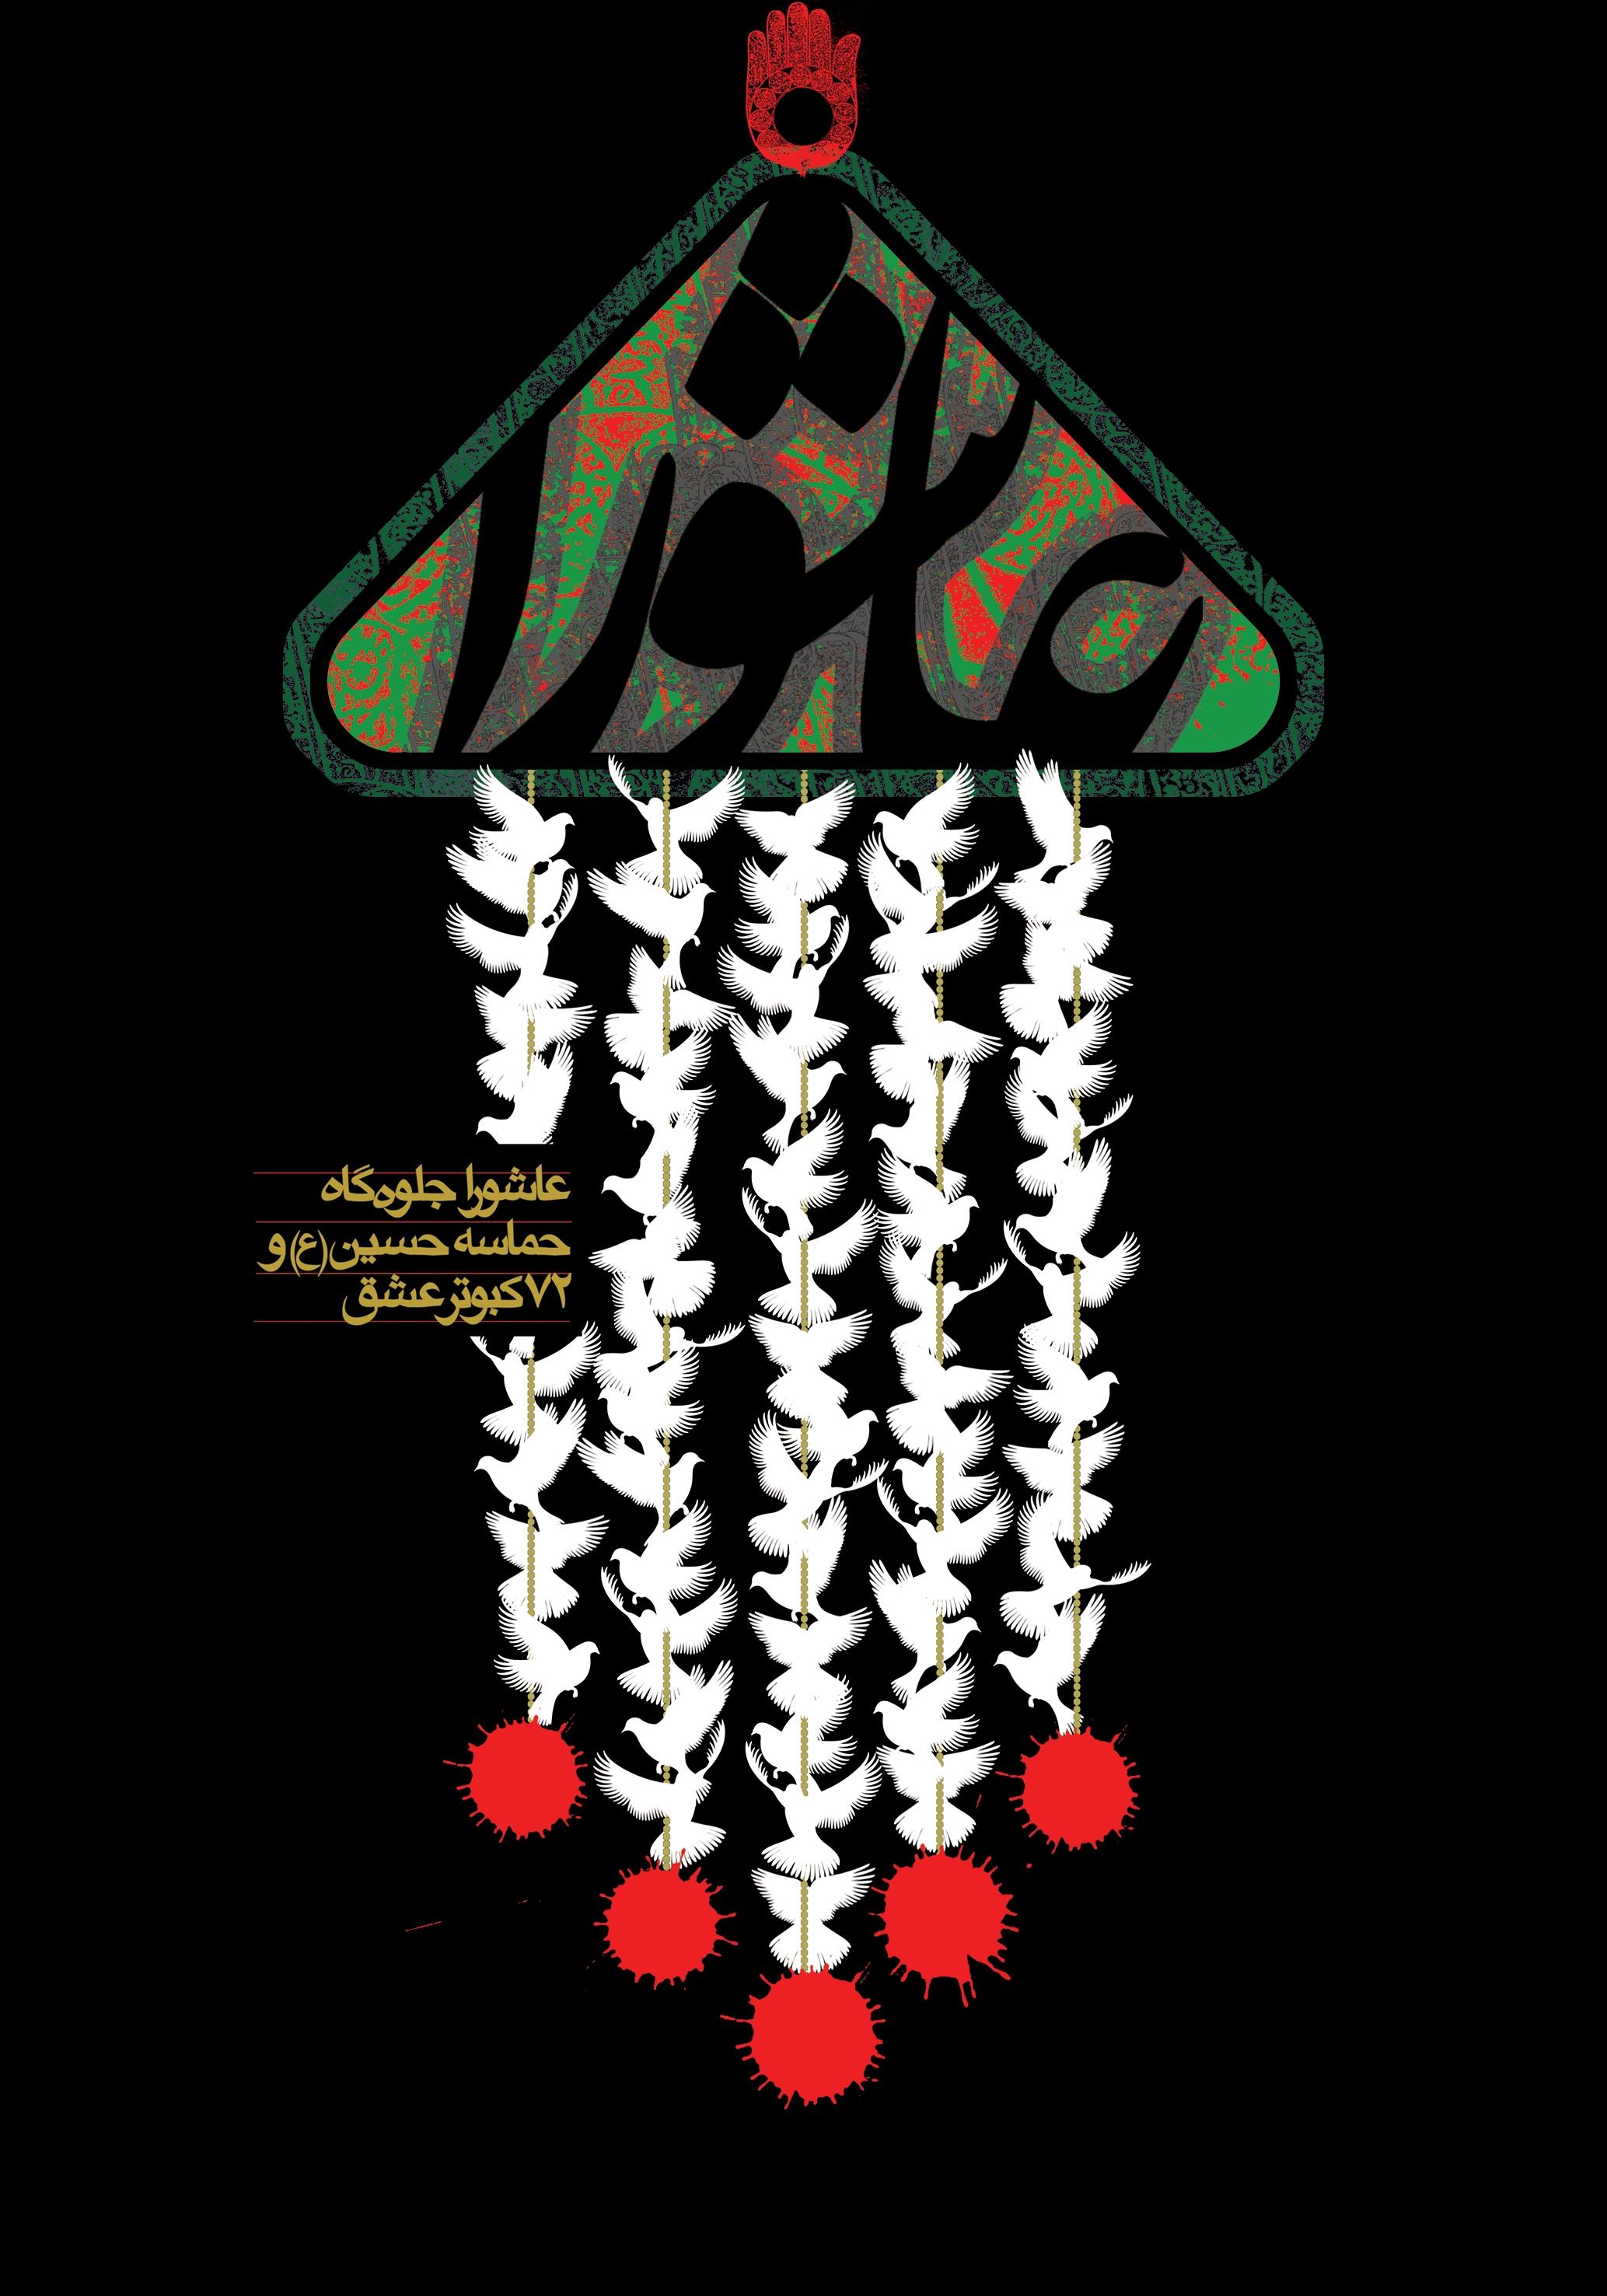 ۷۲_lovers_bird_by_islamic_shia_artists